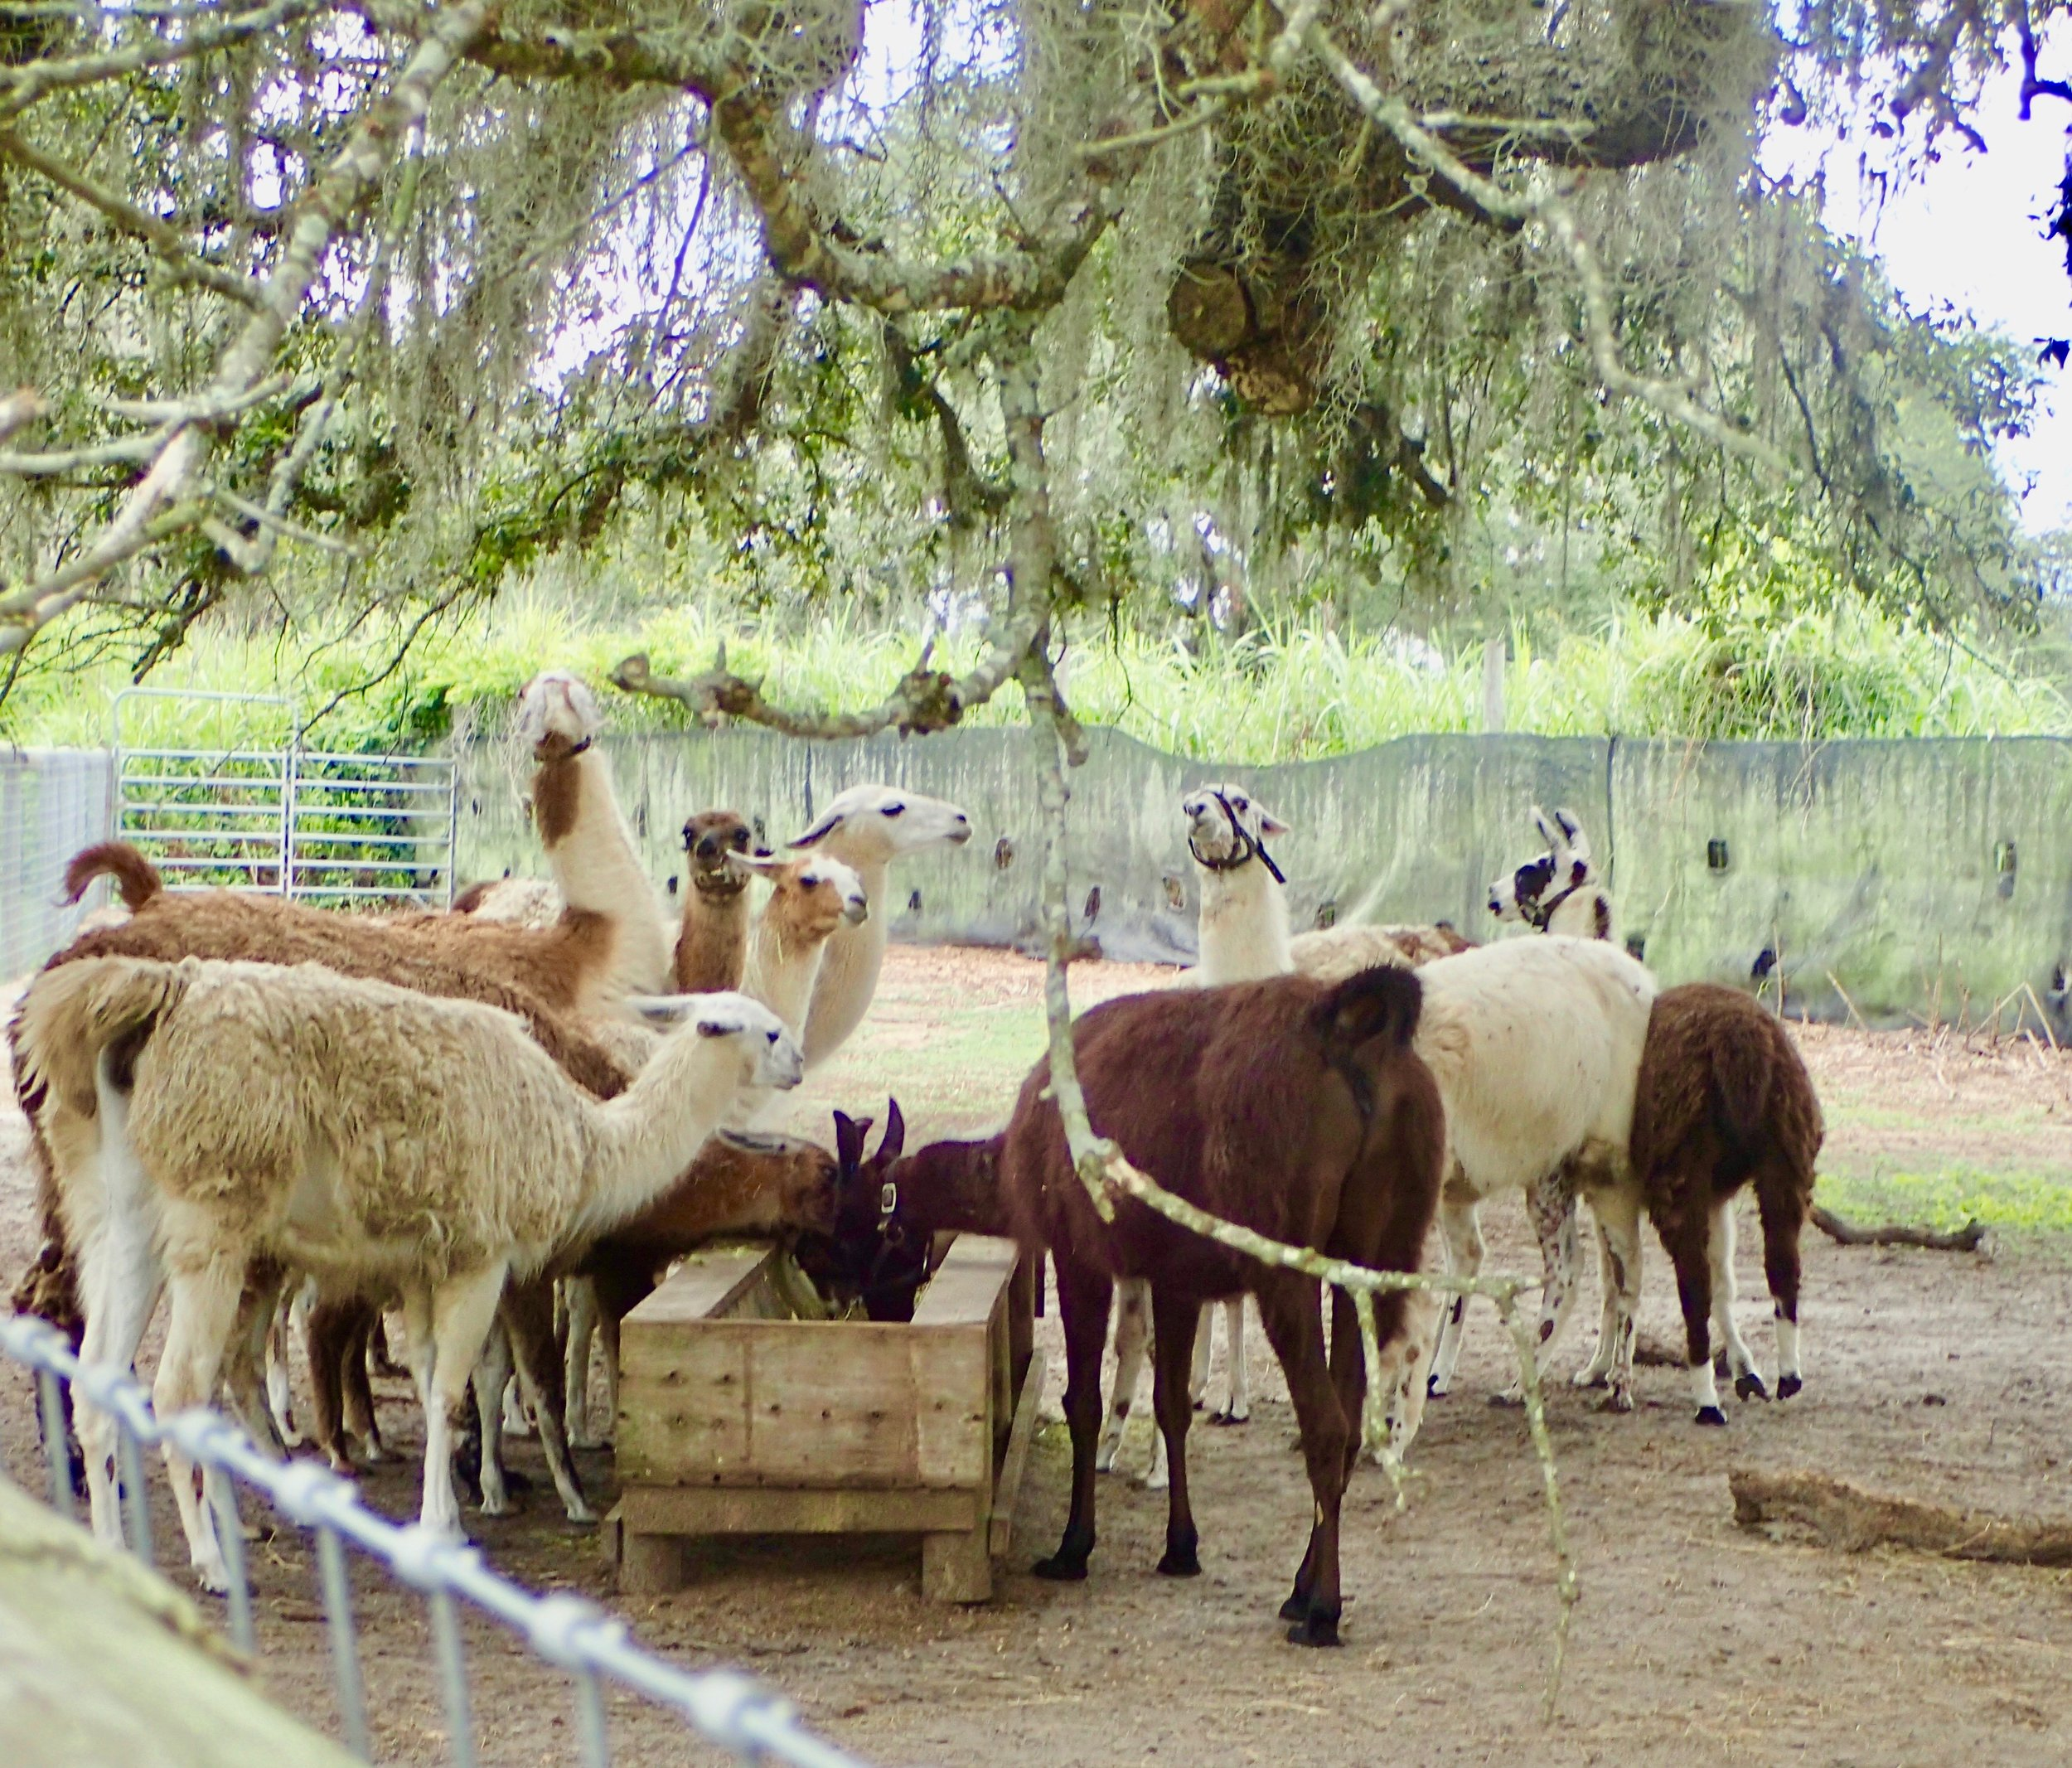 Giraffe Ranch Segway safari llamas